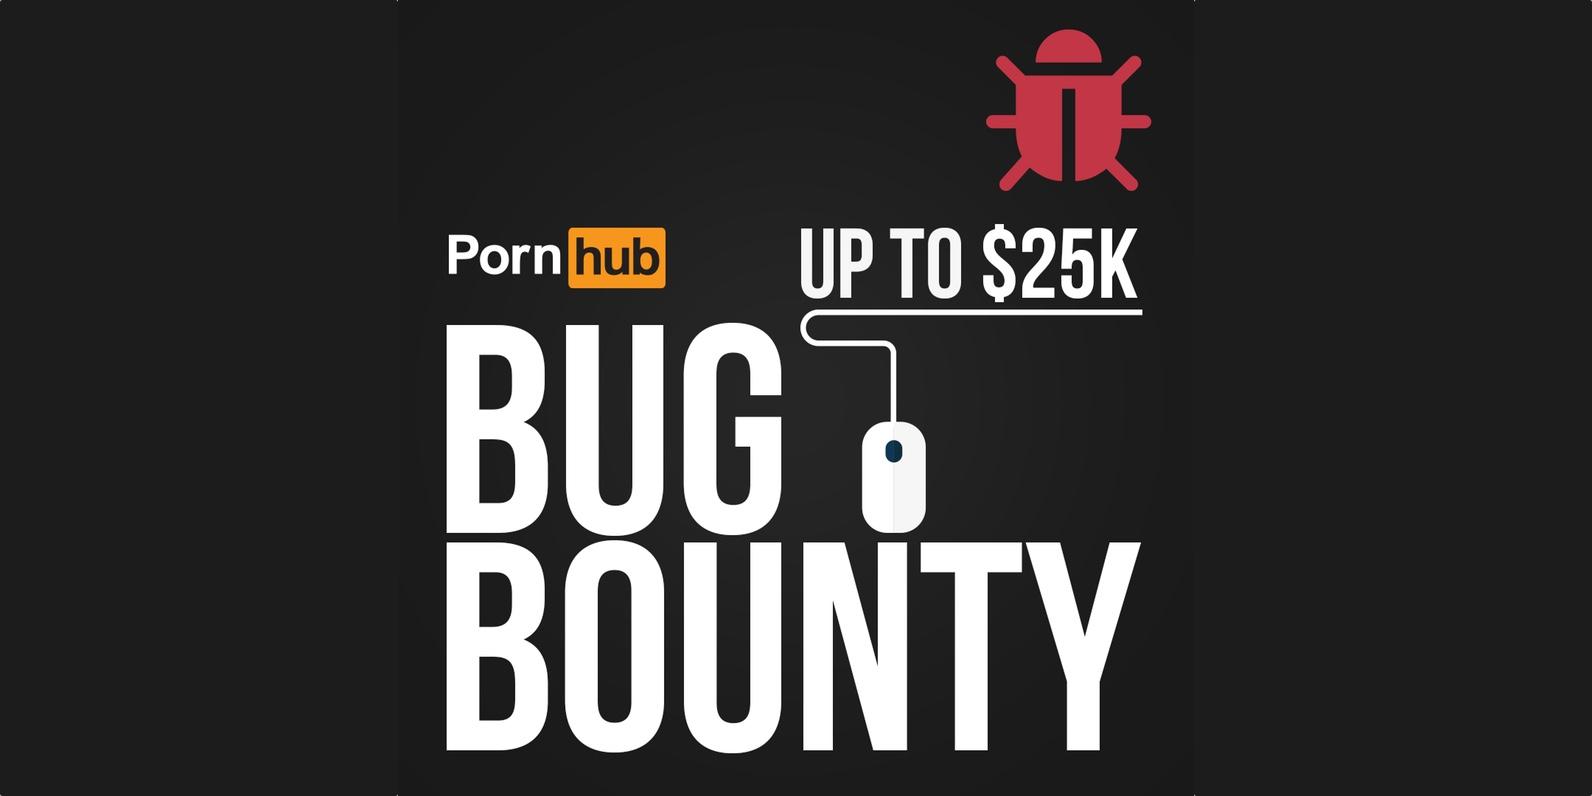 PornhubBugBounty.jpg